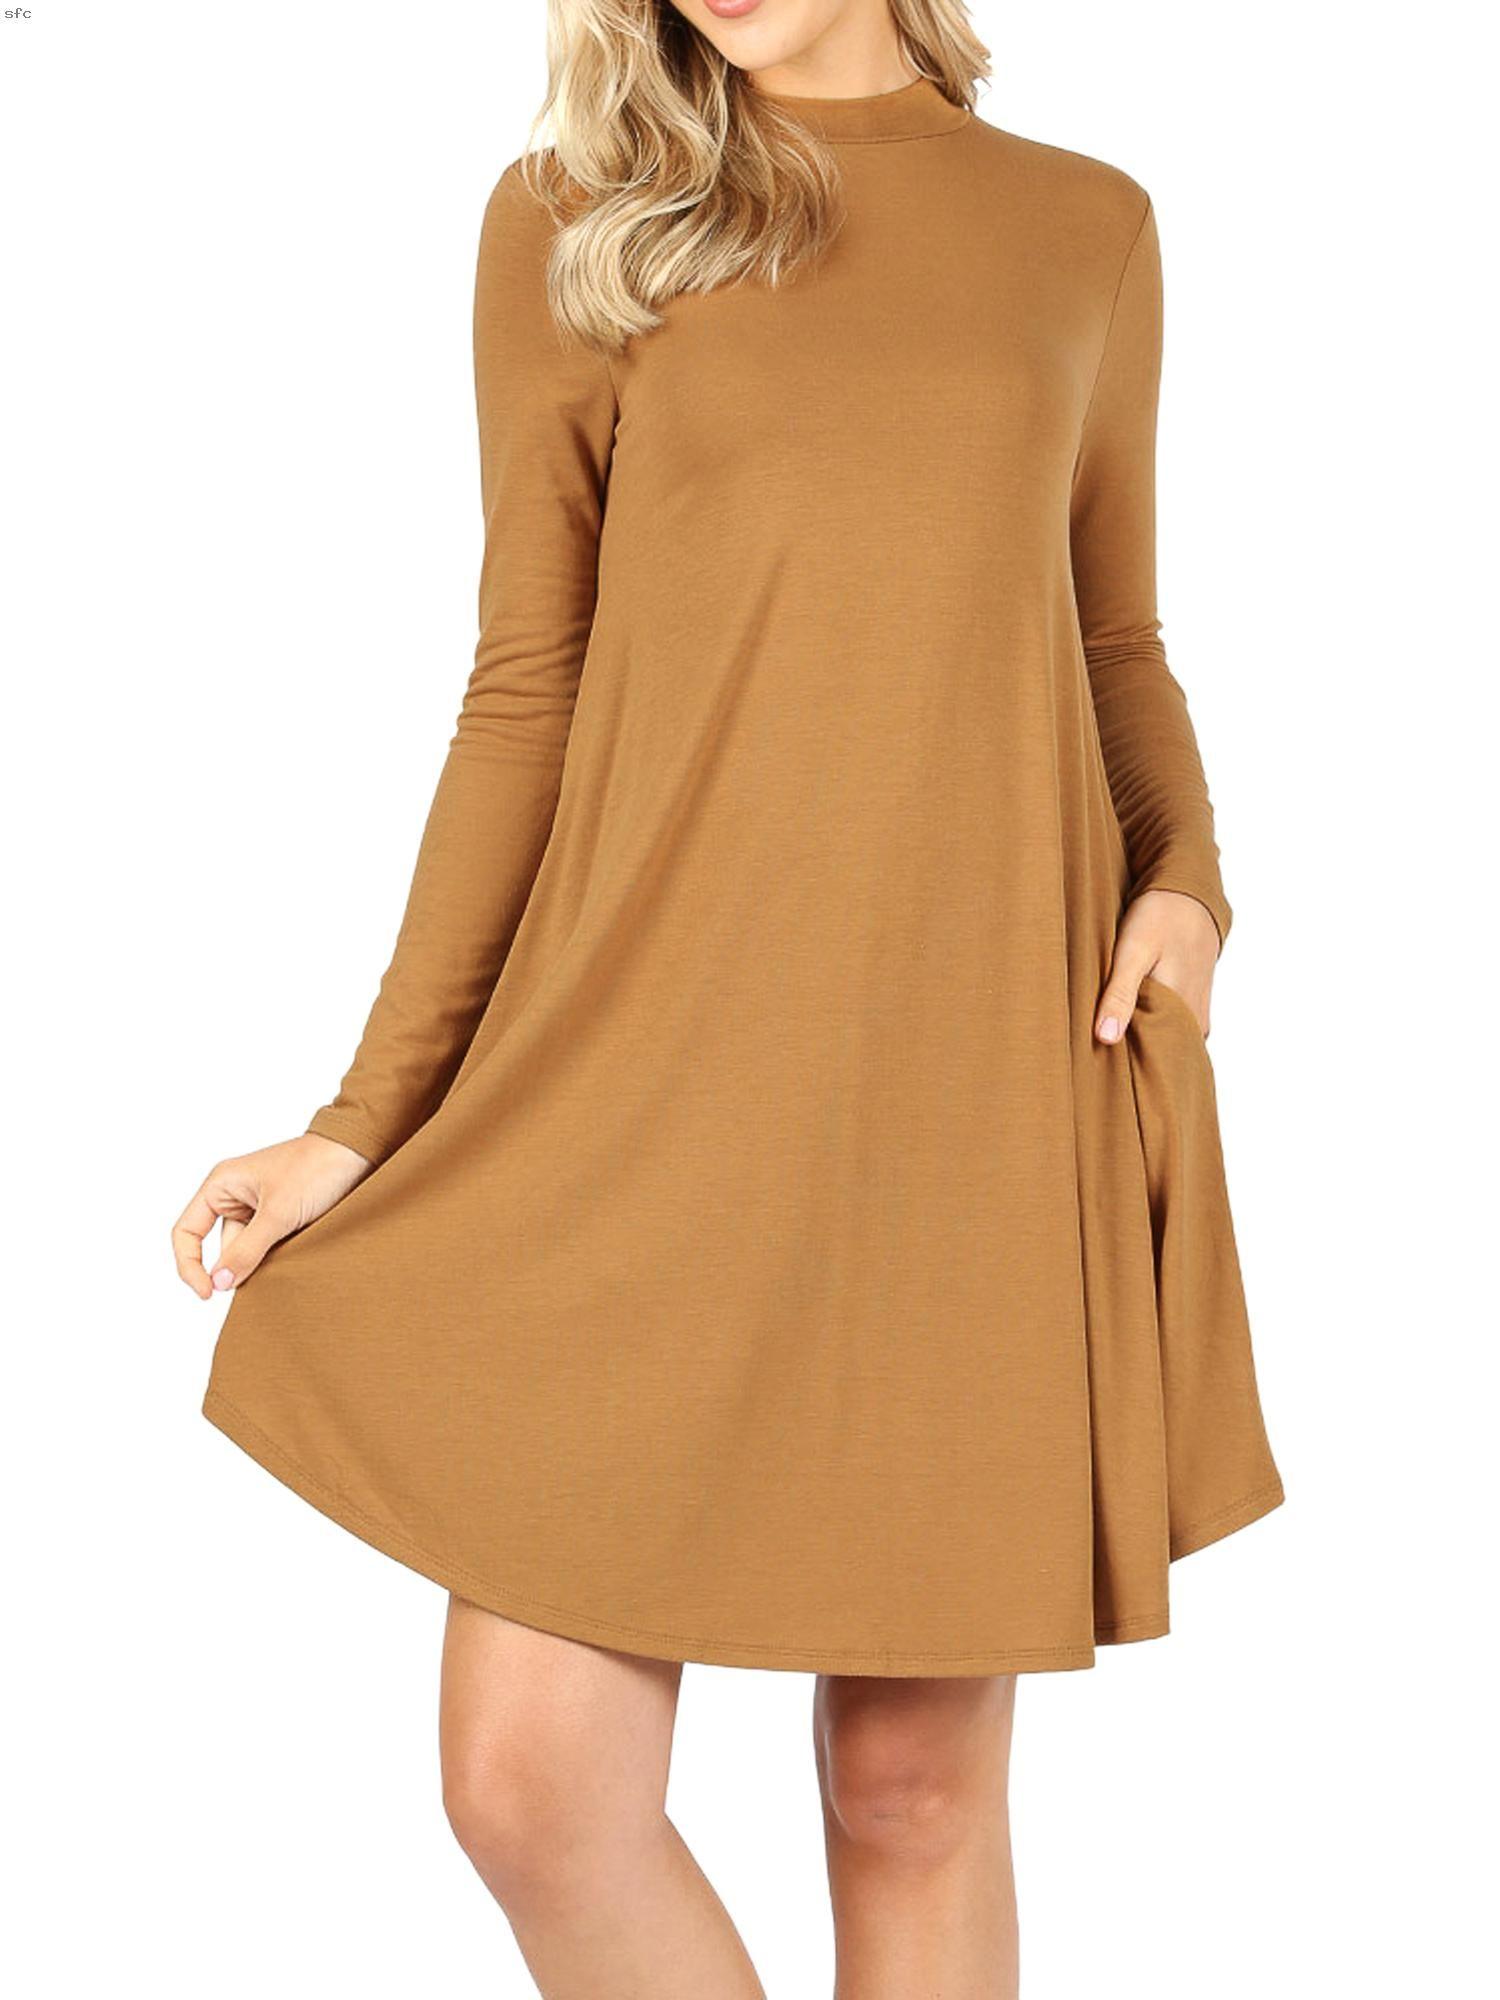 Womens Plus Mock Neck Long Sleeve Flared A Line Tunic Midi Dress With Pockets In 2020 Crewneck Dress Printed Sheath Dresses Midi Dress [ 2000 x 1500 Pixel ]